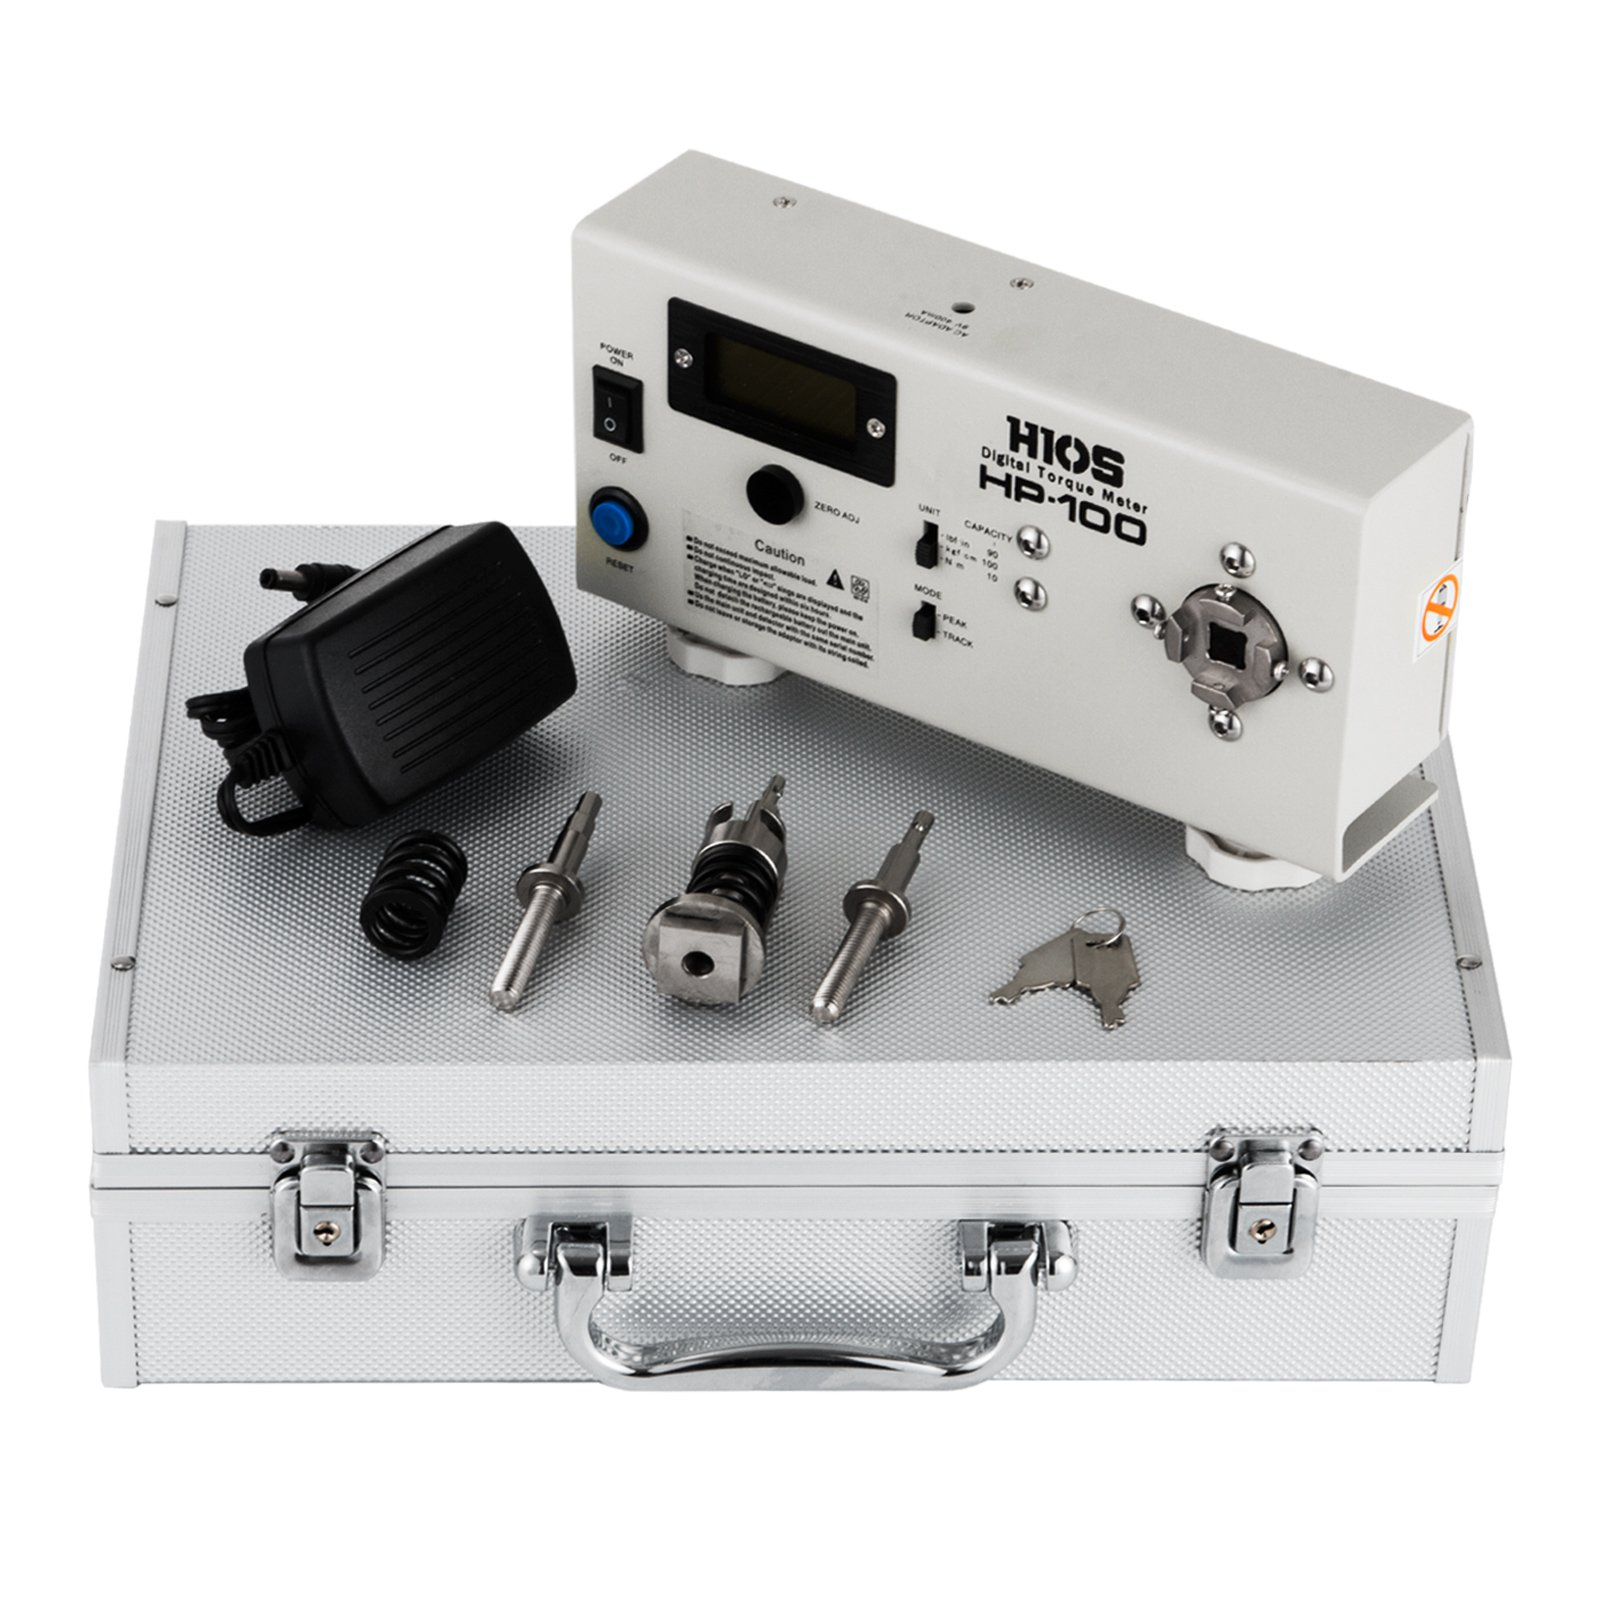 Mophorn Digital Torque Meter HP-100 Wrench Measure Tester Screw Driver +-0.005 Precision Portable LCD Digital Torque Tester Torsion Meter Tester Testing Instrument Torque Meter (HP-100)